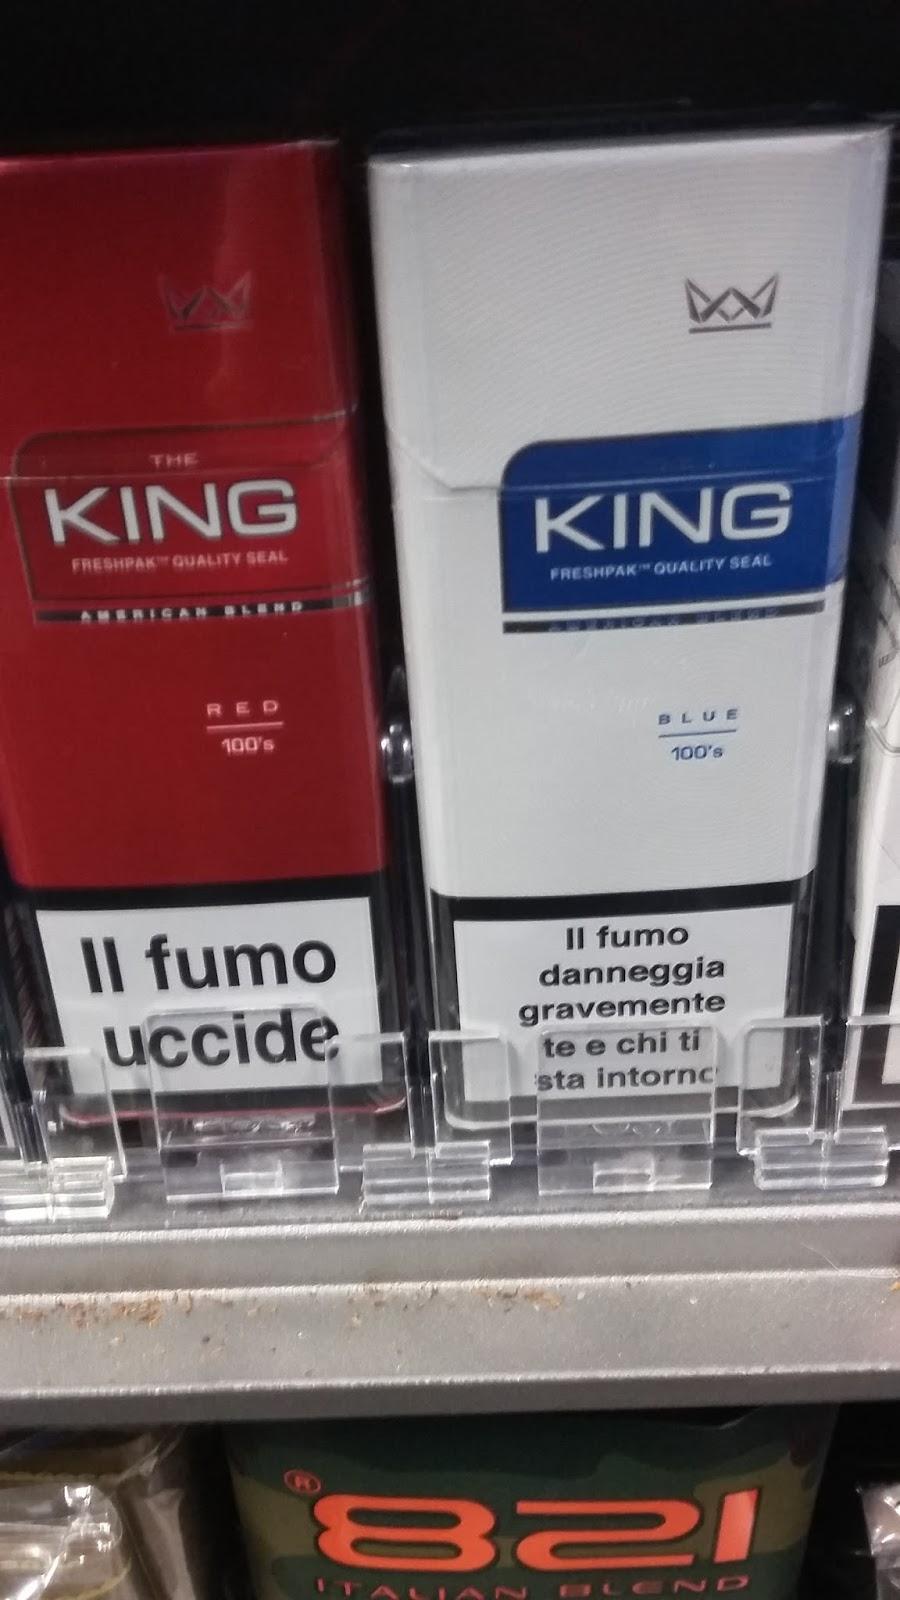 tabaccheriamauriziofuma: sigarette THE KING 100S in pacchetto da ...